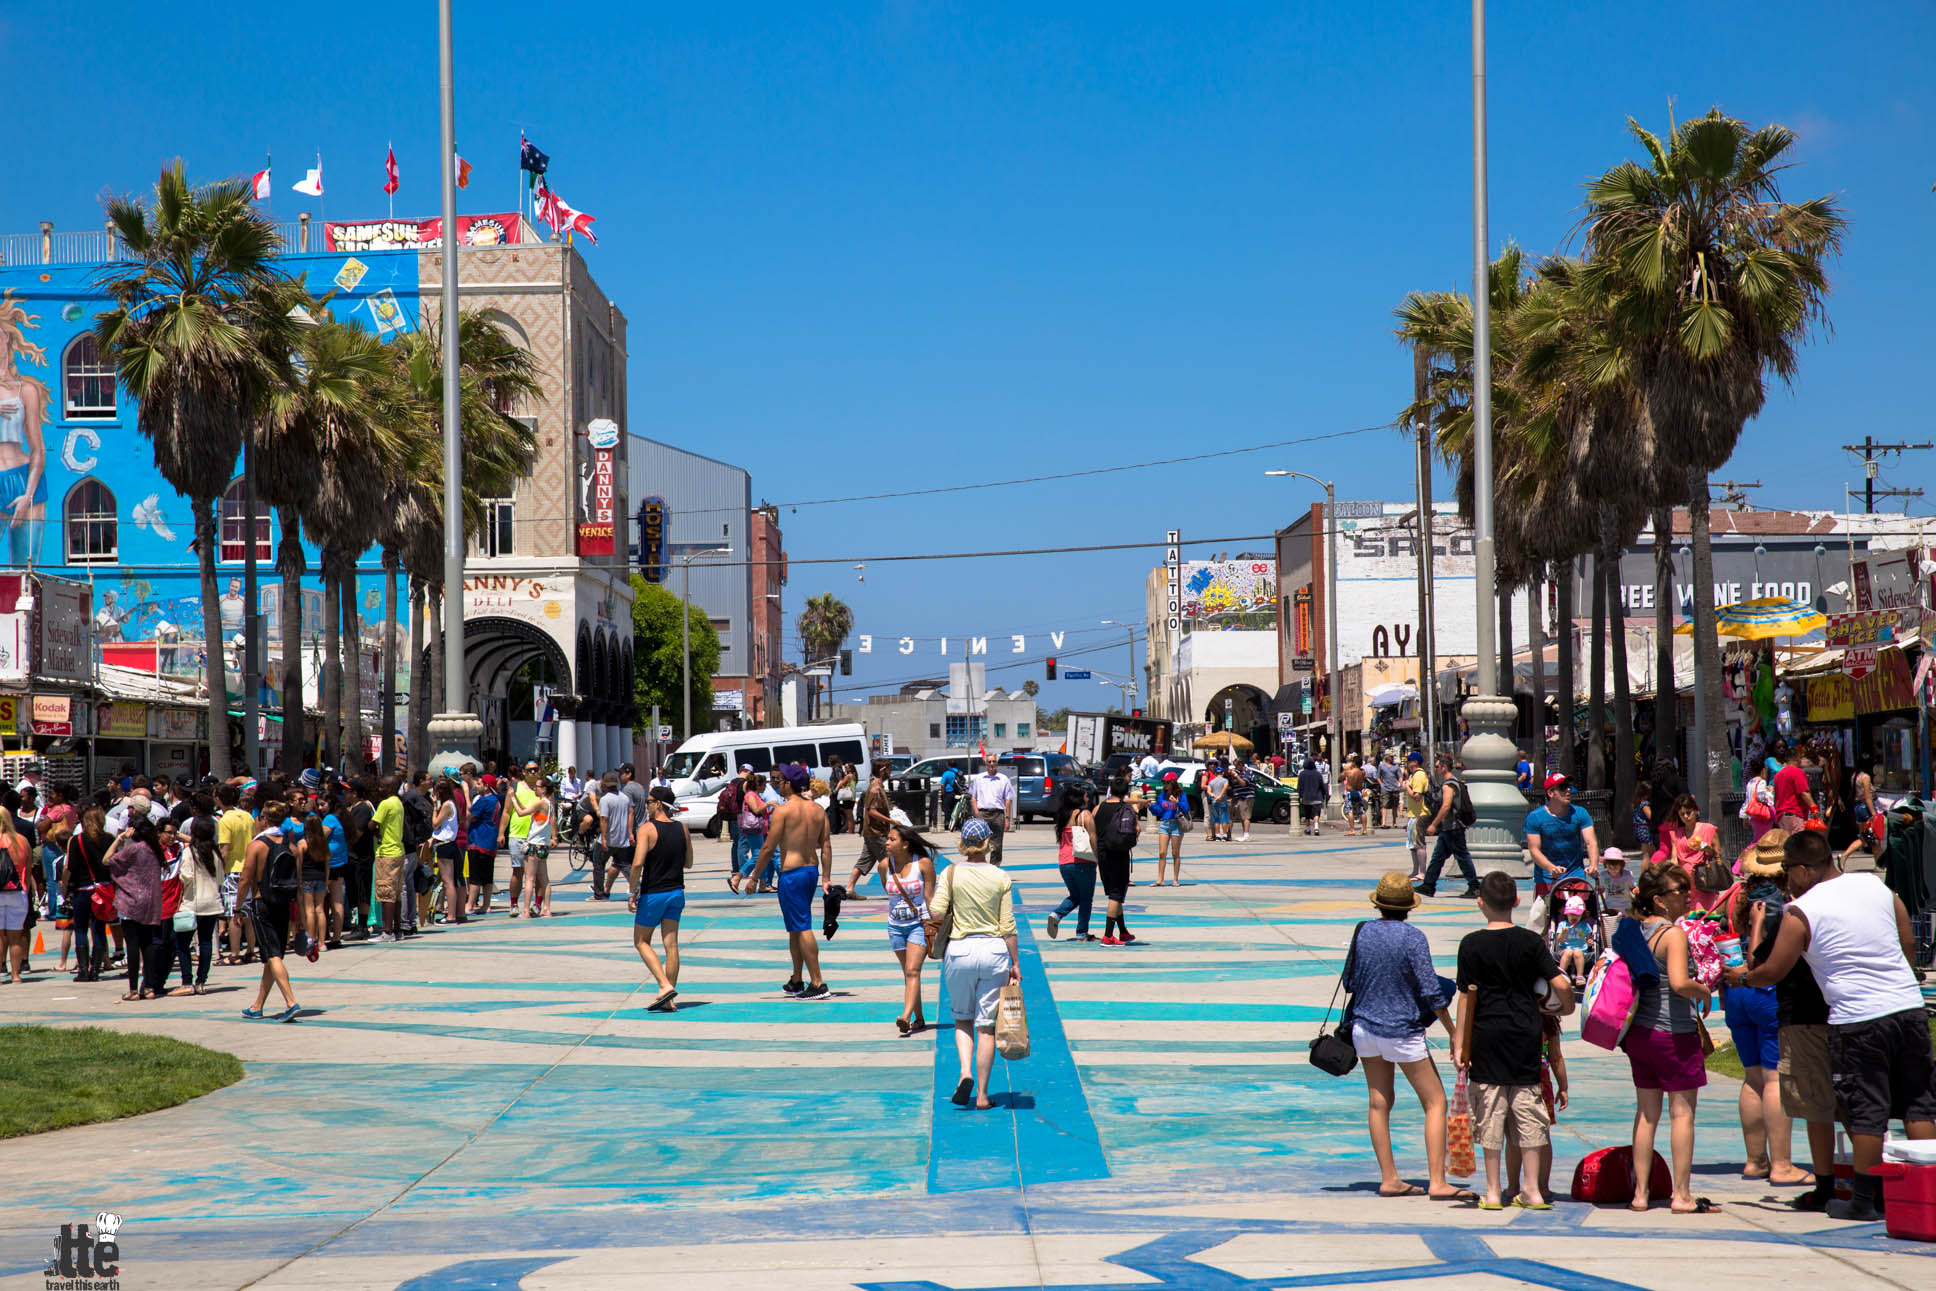 Venice Beach- Postcards From The California Boardwalk